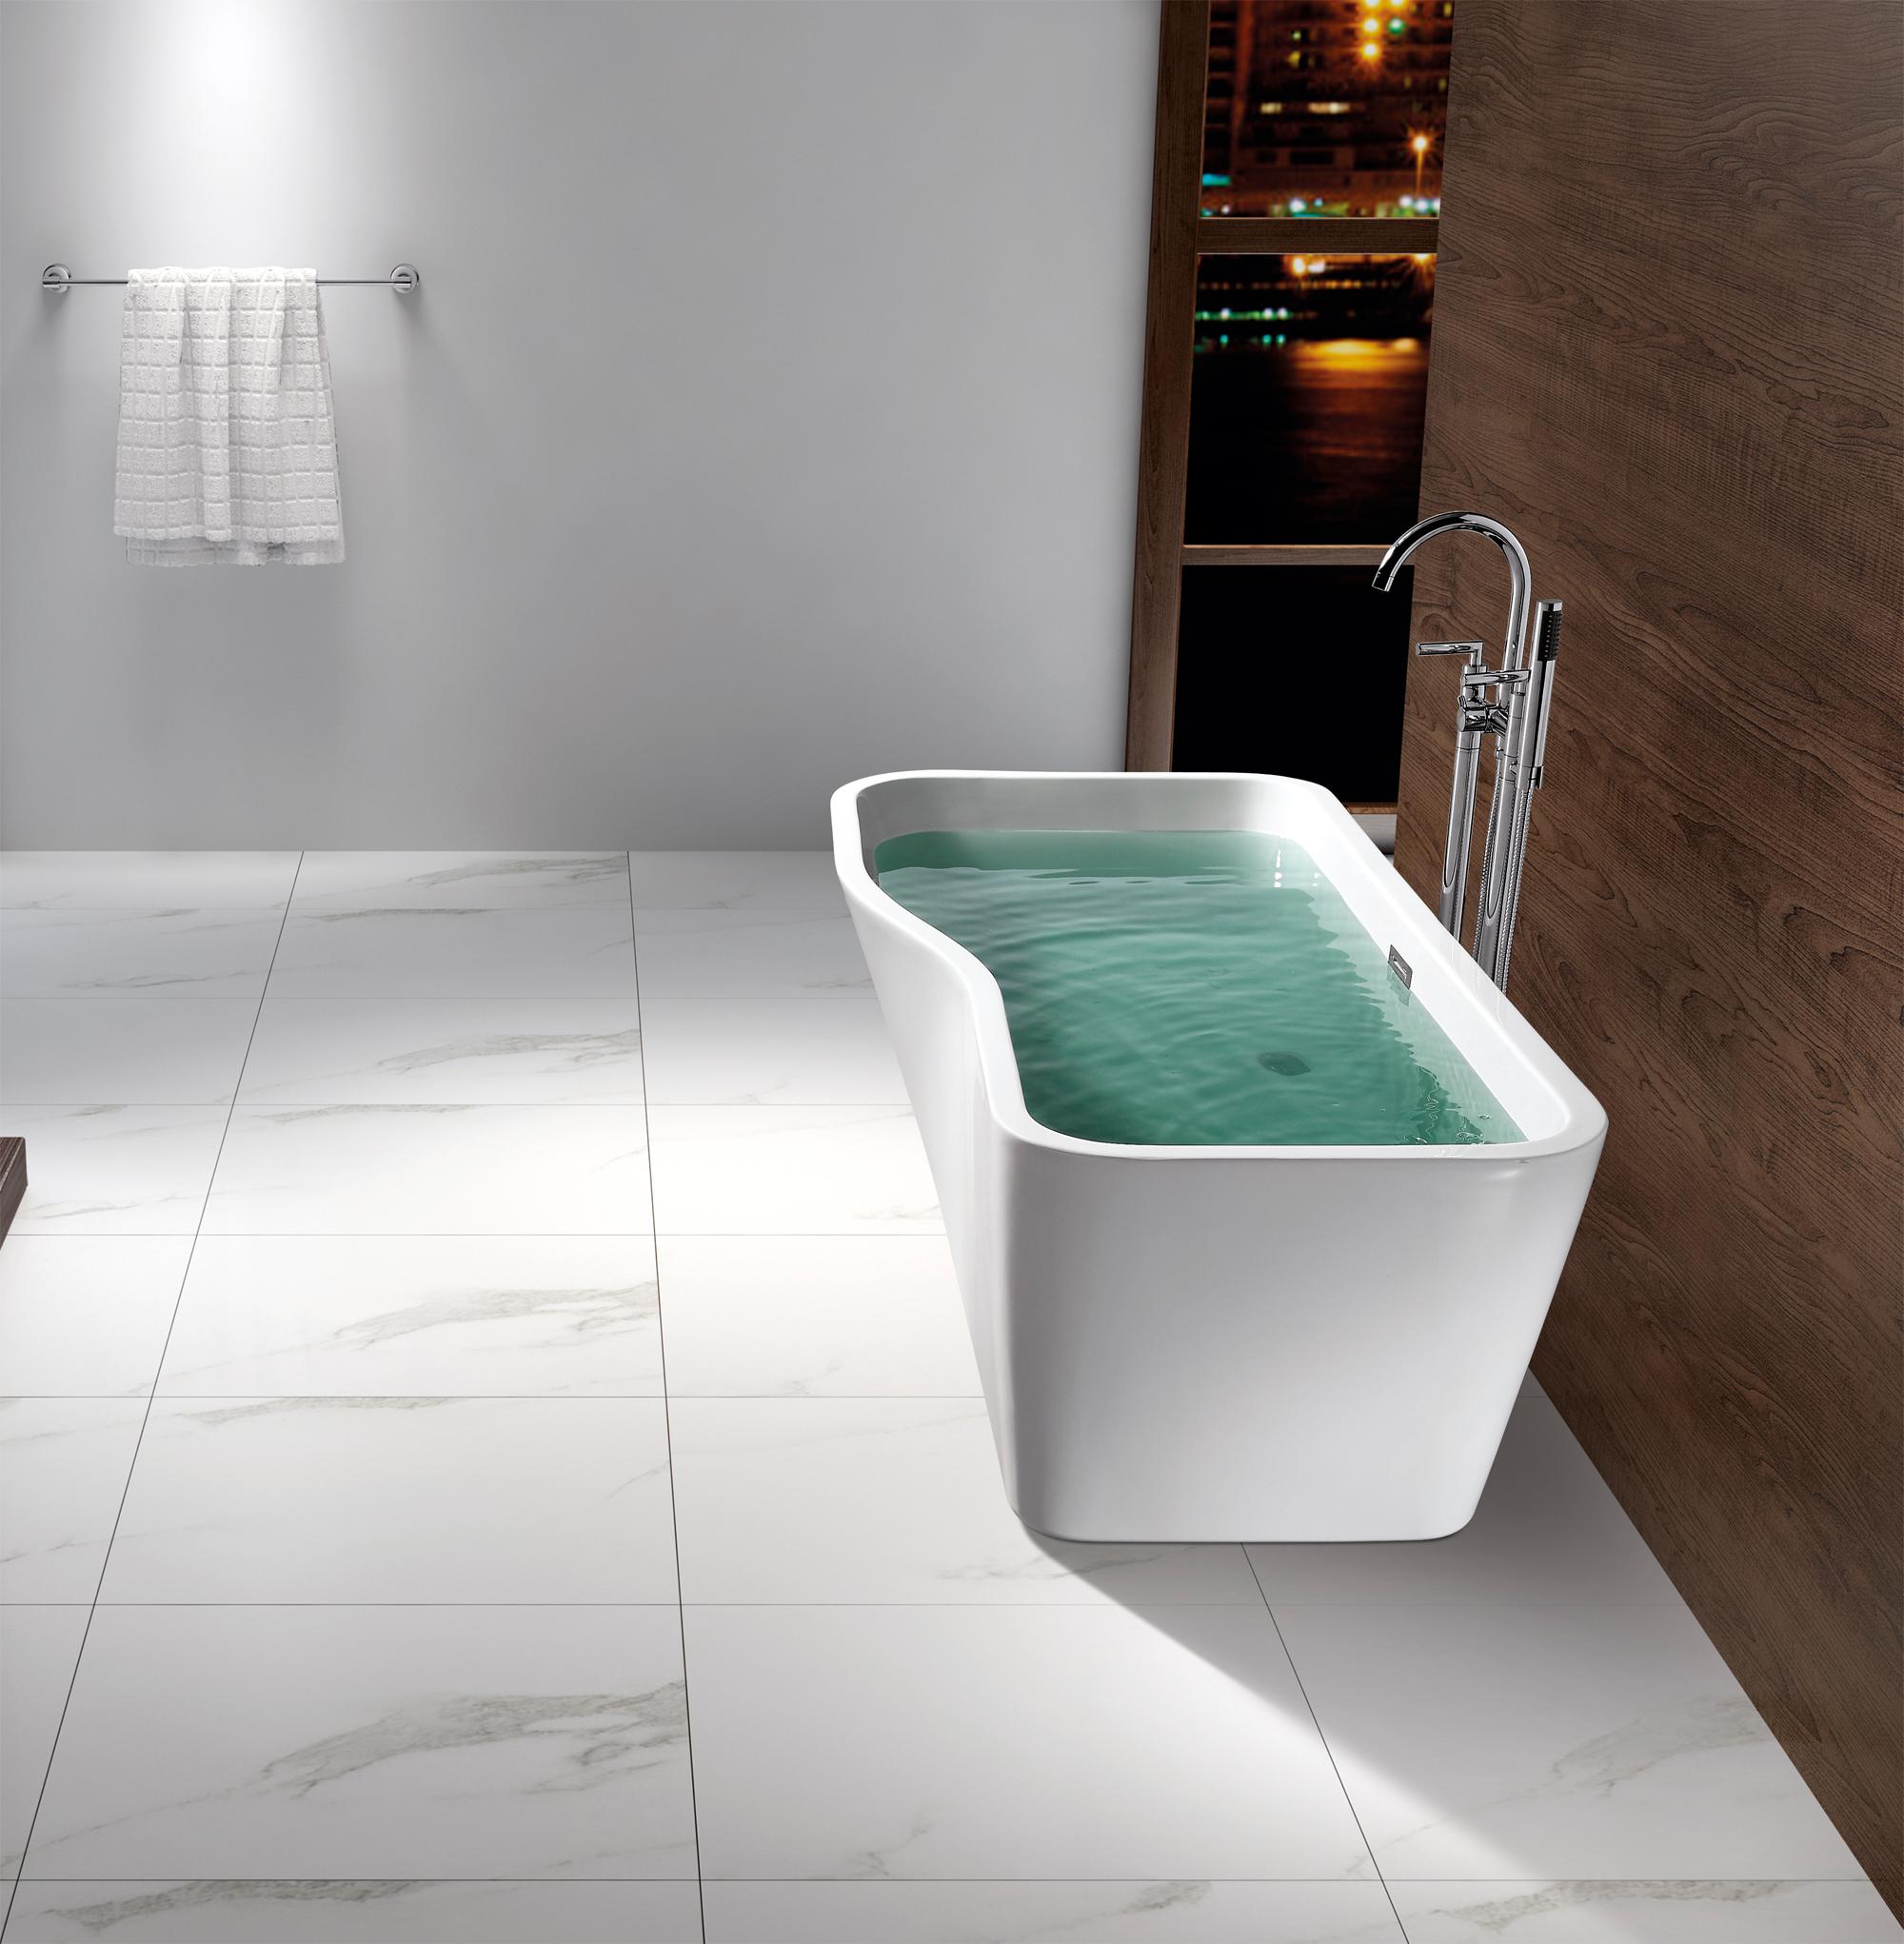 Vasca da bagno freestanding sylt rubinetti a scelta - Vasca da bagno freestanding ...